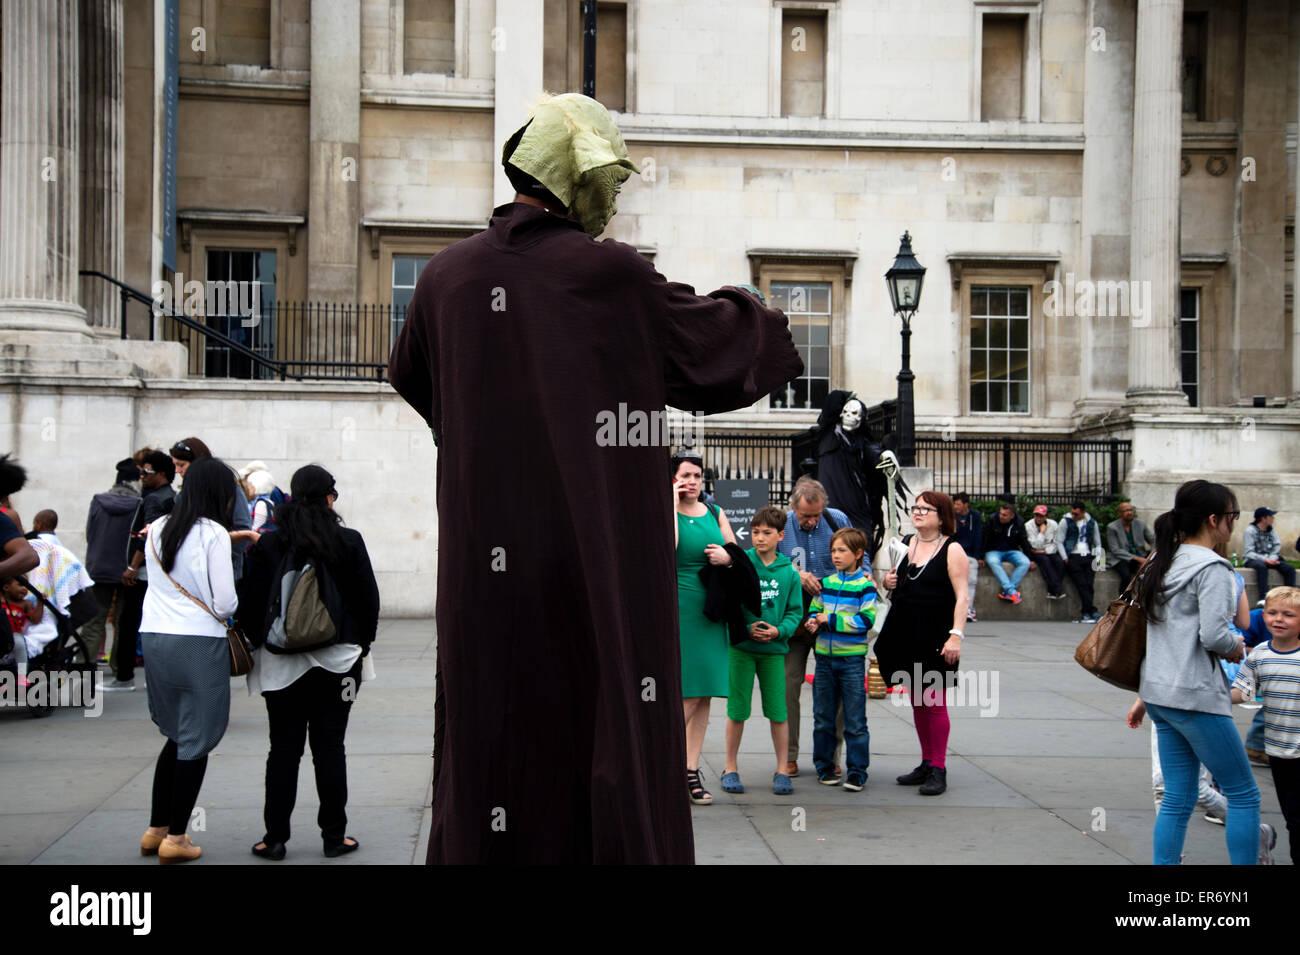 Trafalgar Square. Street entertainers pose for tourists - Stock Image